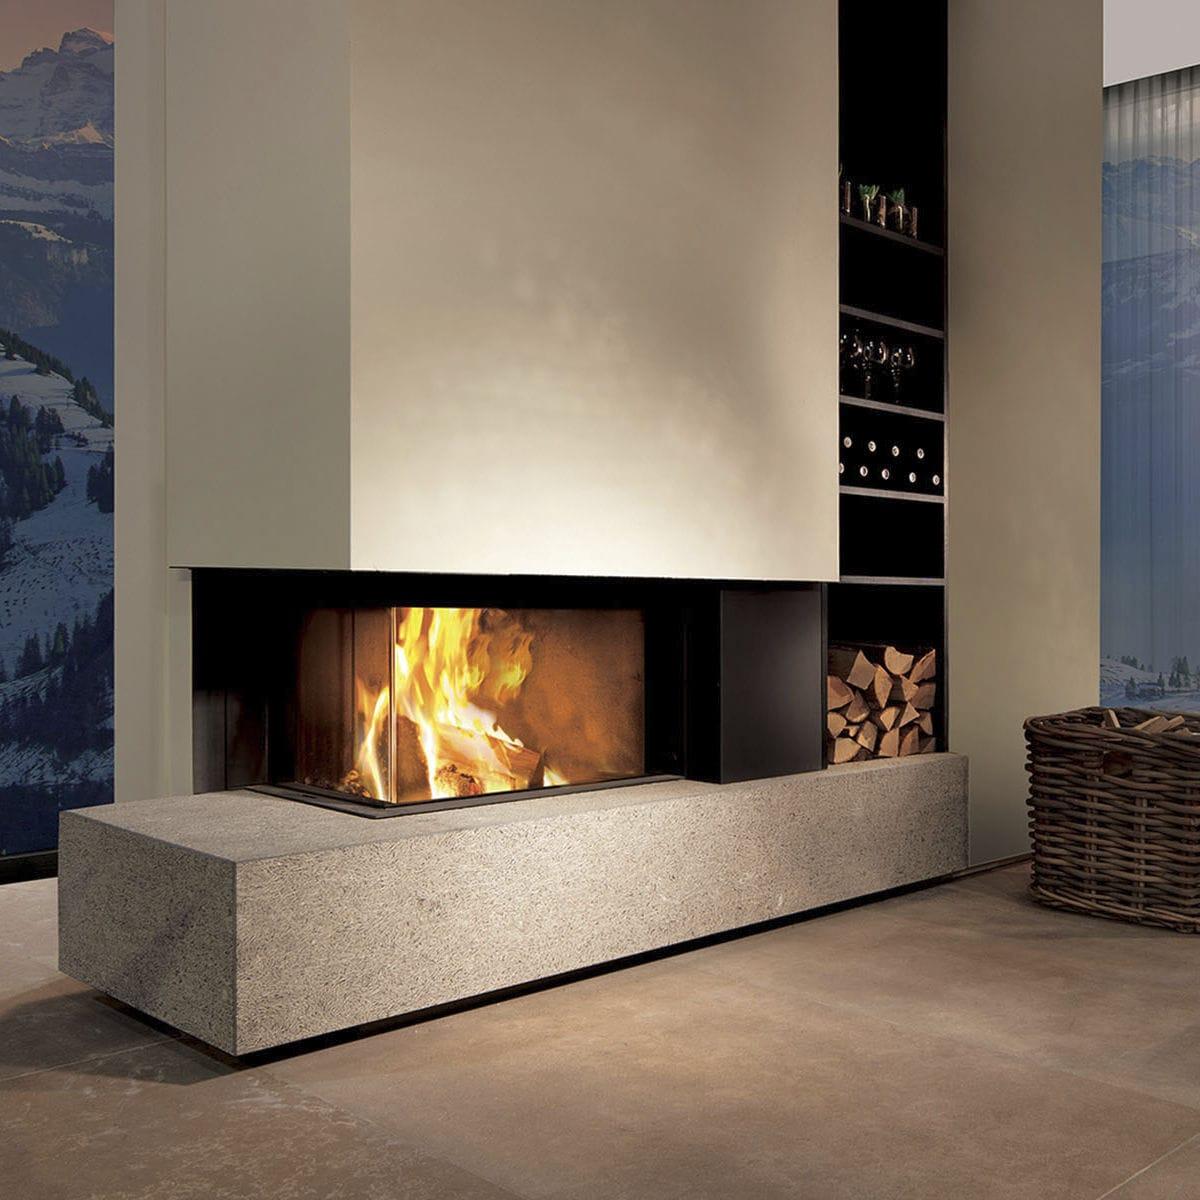 Cheminee A Bois W65 38c Attika Feuer Ag Contemporaine A Foyer Ferme D Angle